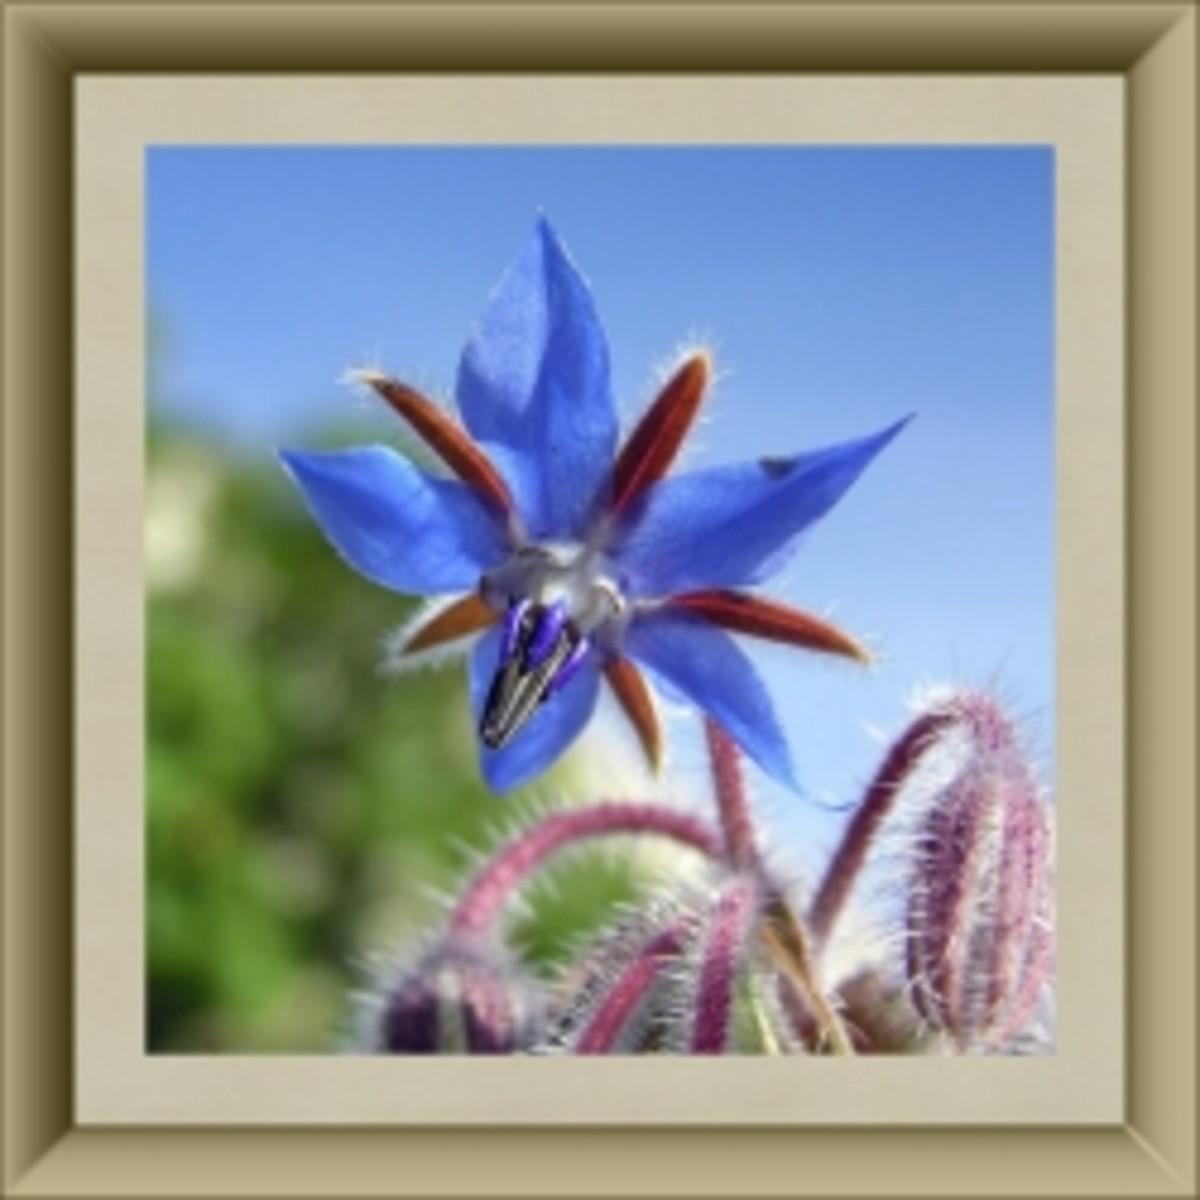 50 Delightful Edible Flowers